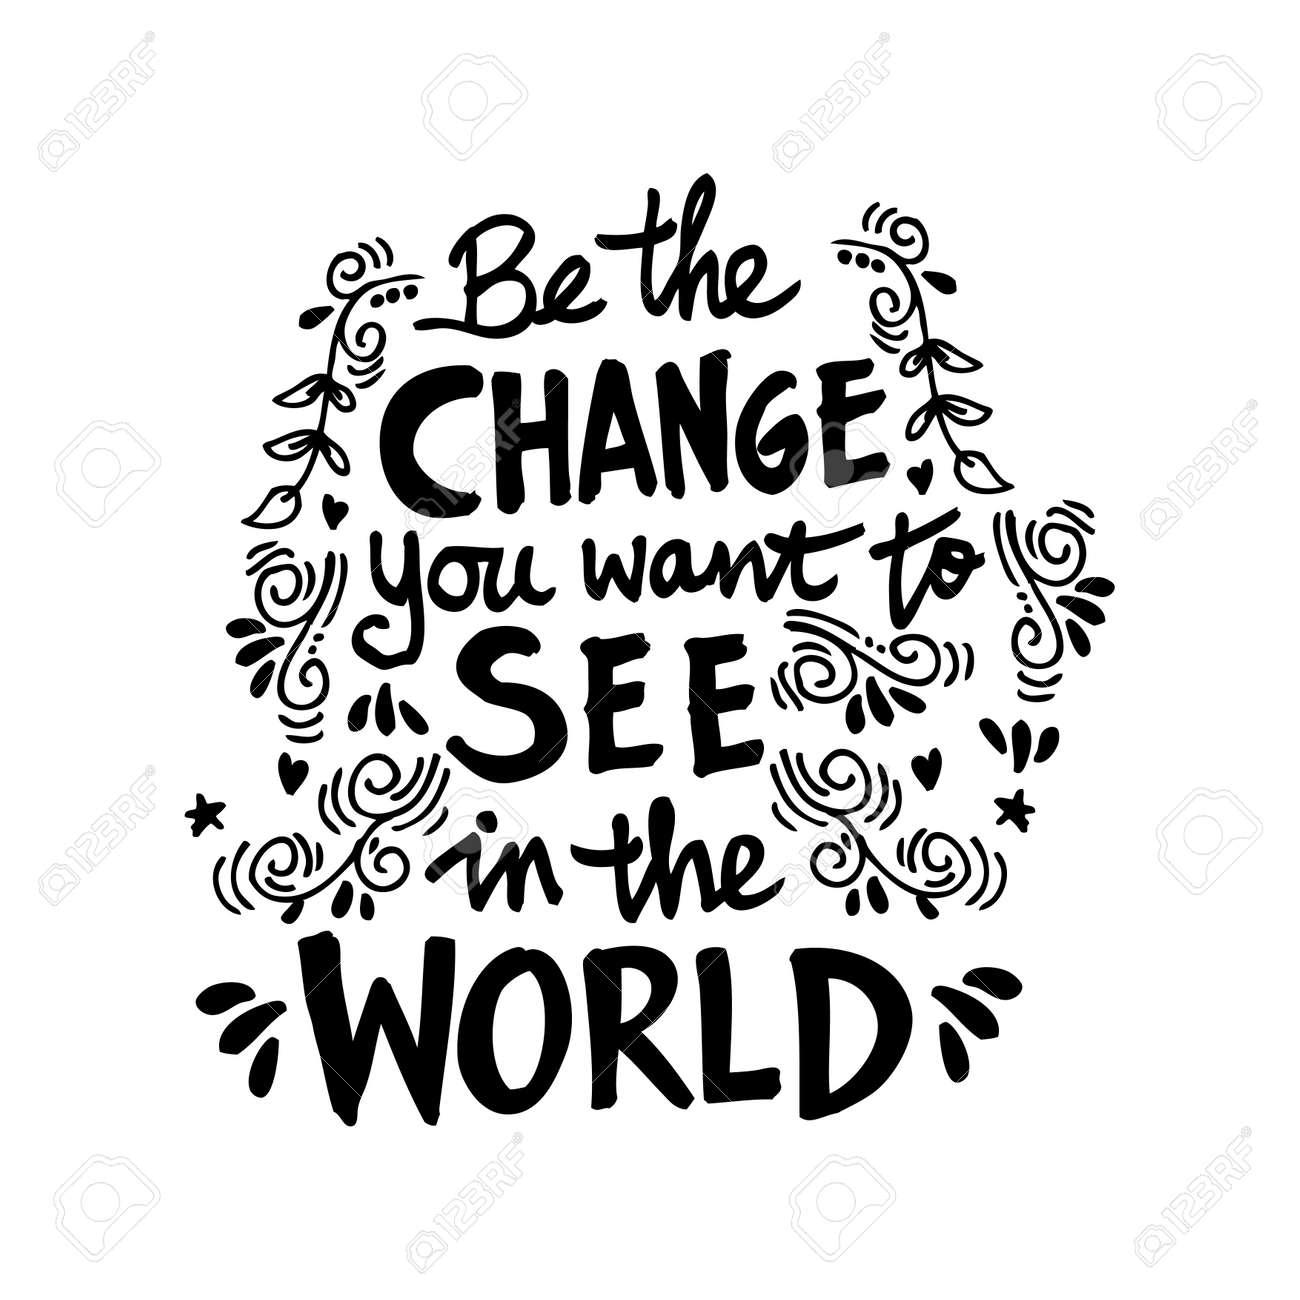 Inspirational Motivating Quotes By Mahatma Gandhi Royalty Free